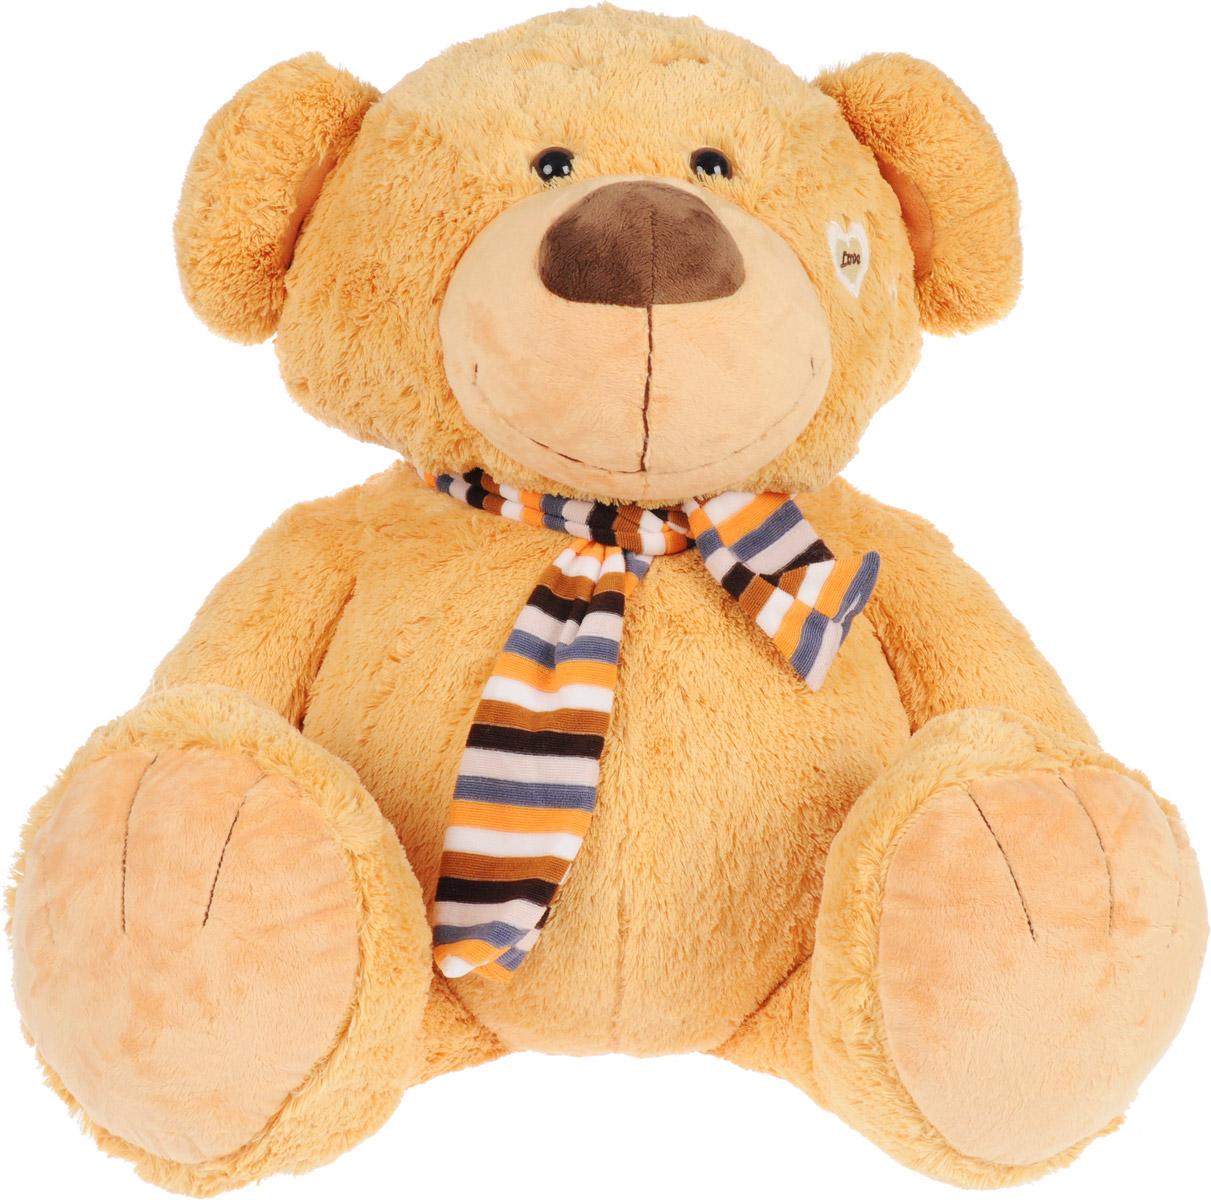 Magic Bear Toys Мягкая игрушка Медвежонок в шарфе 80 см magic bear toys мягкая игрушка ослик чарли 27 см